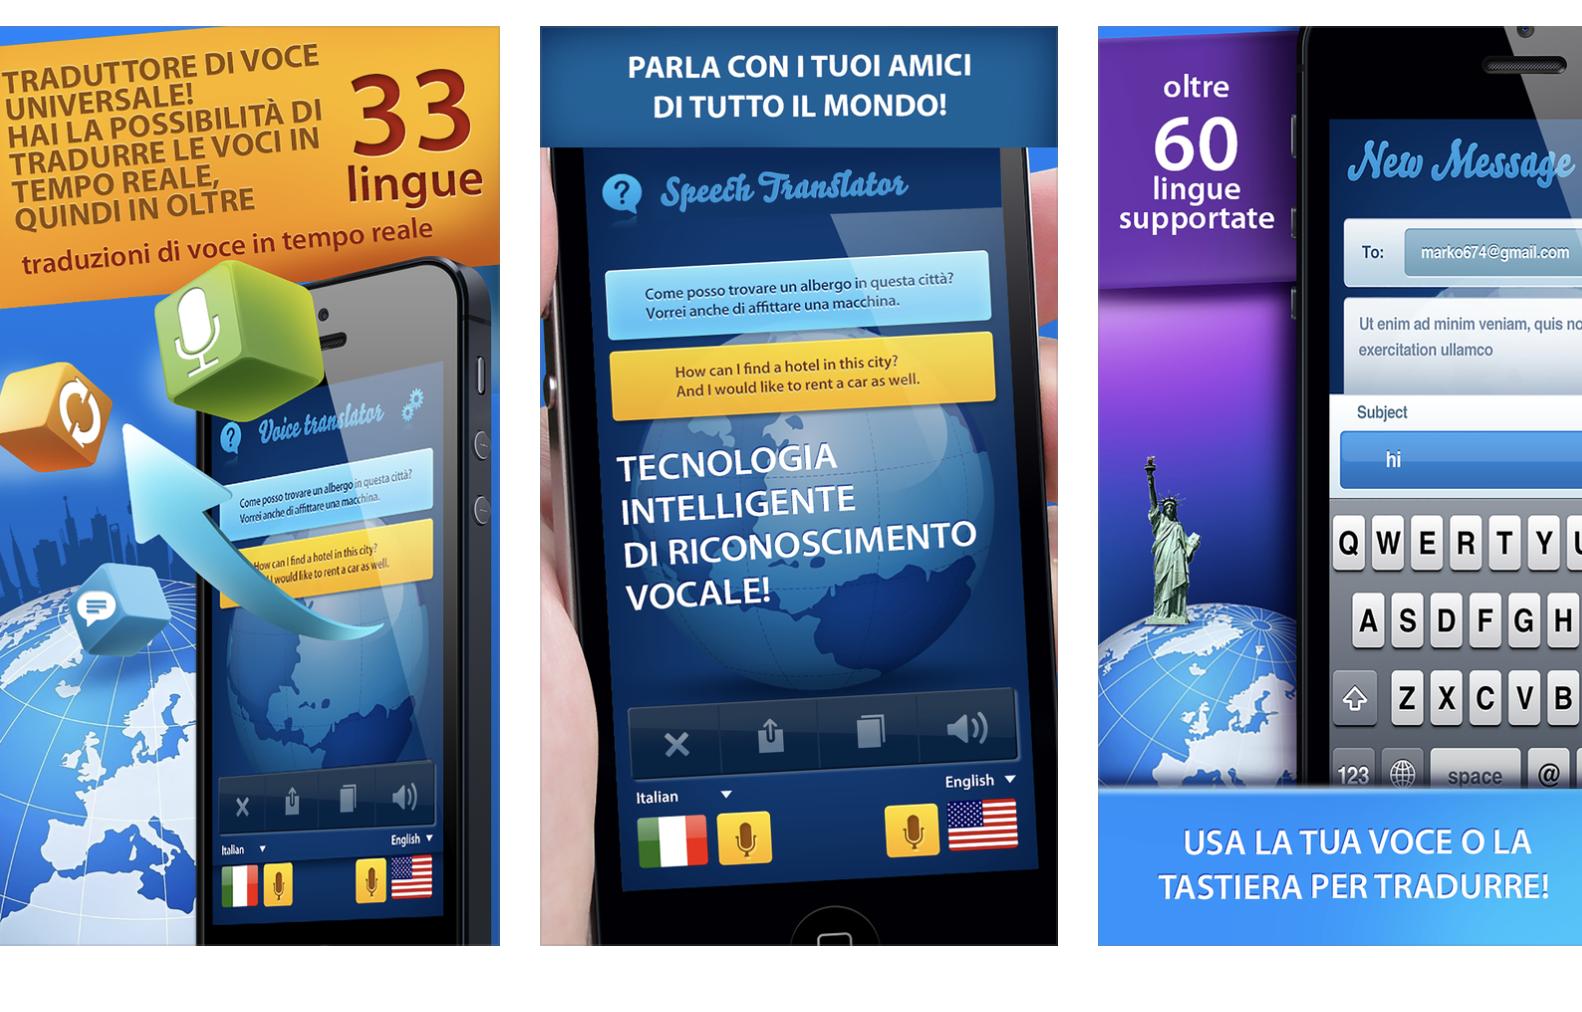 traduttore vocale gratis da